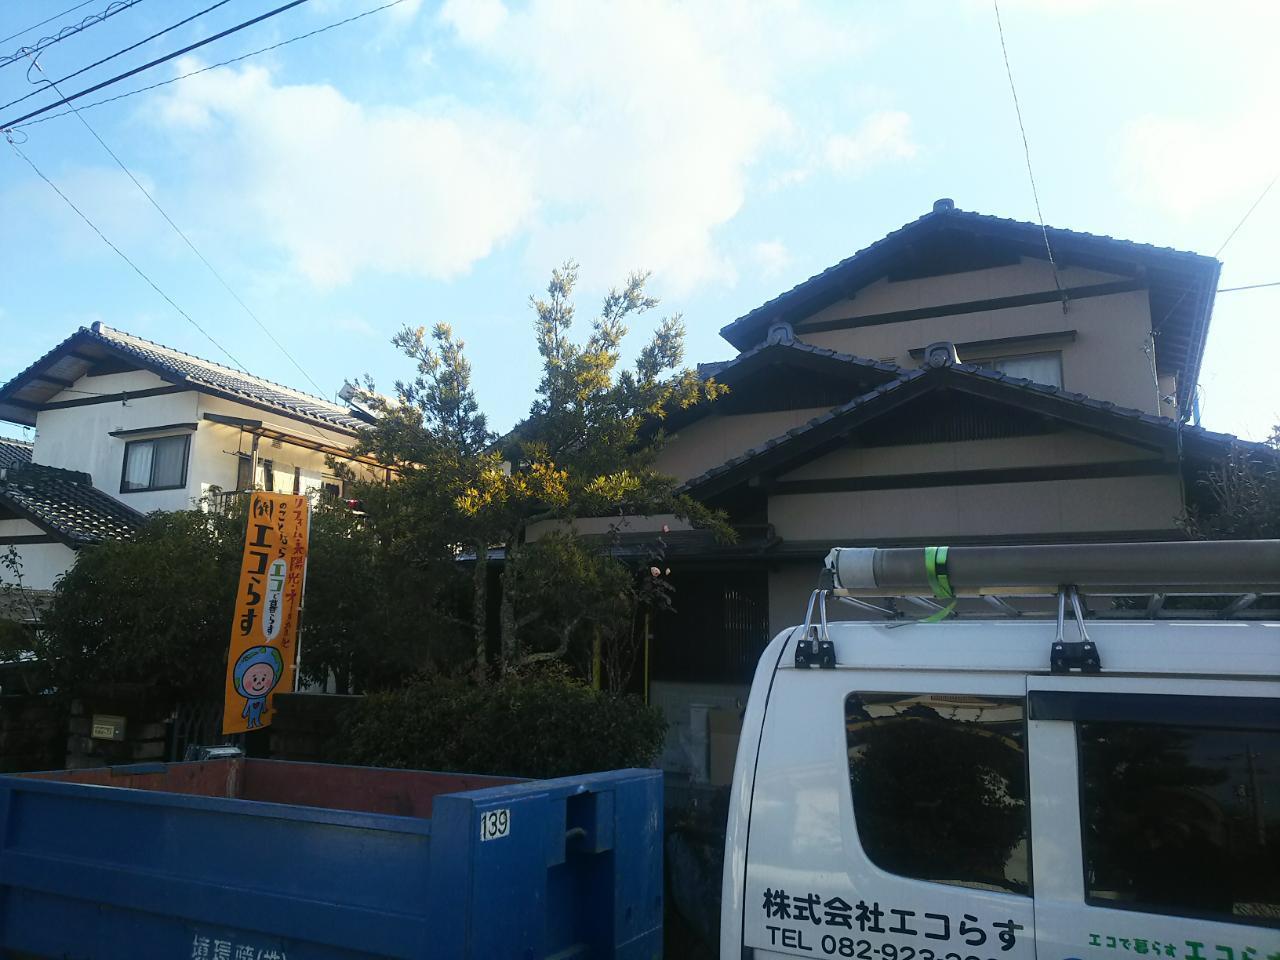 s様邸(杉並台)バス・キッチンリフォーム工事_d0125228_20112197.jpg